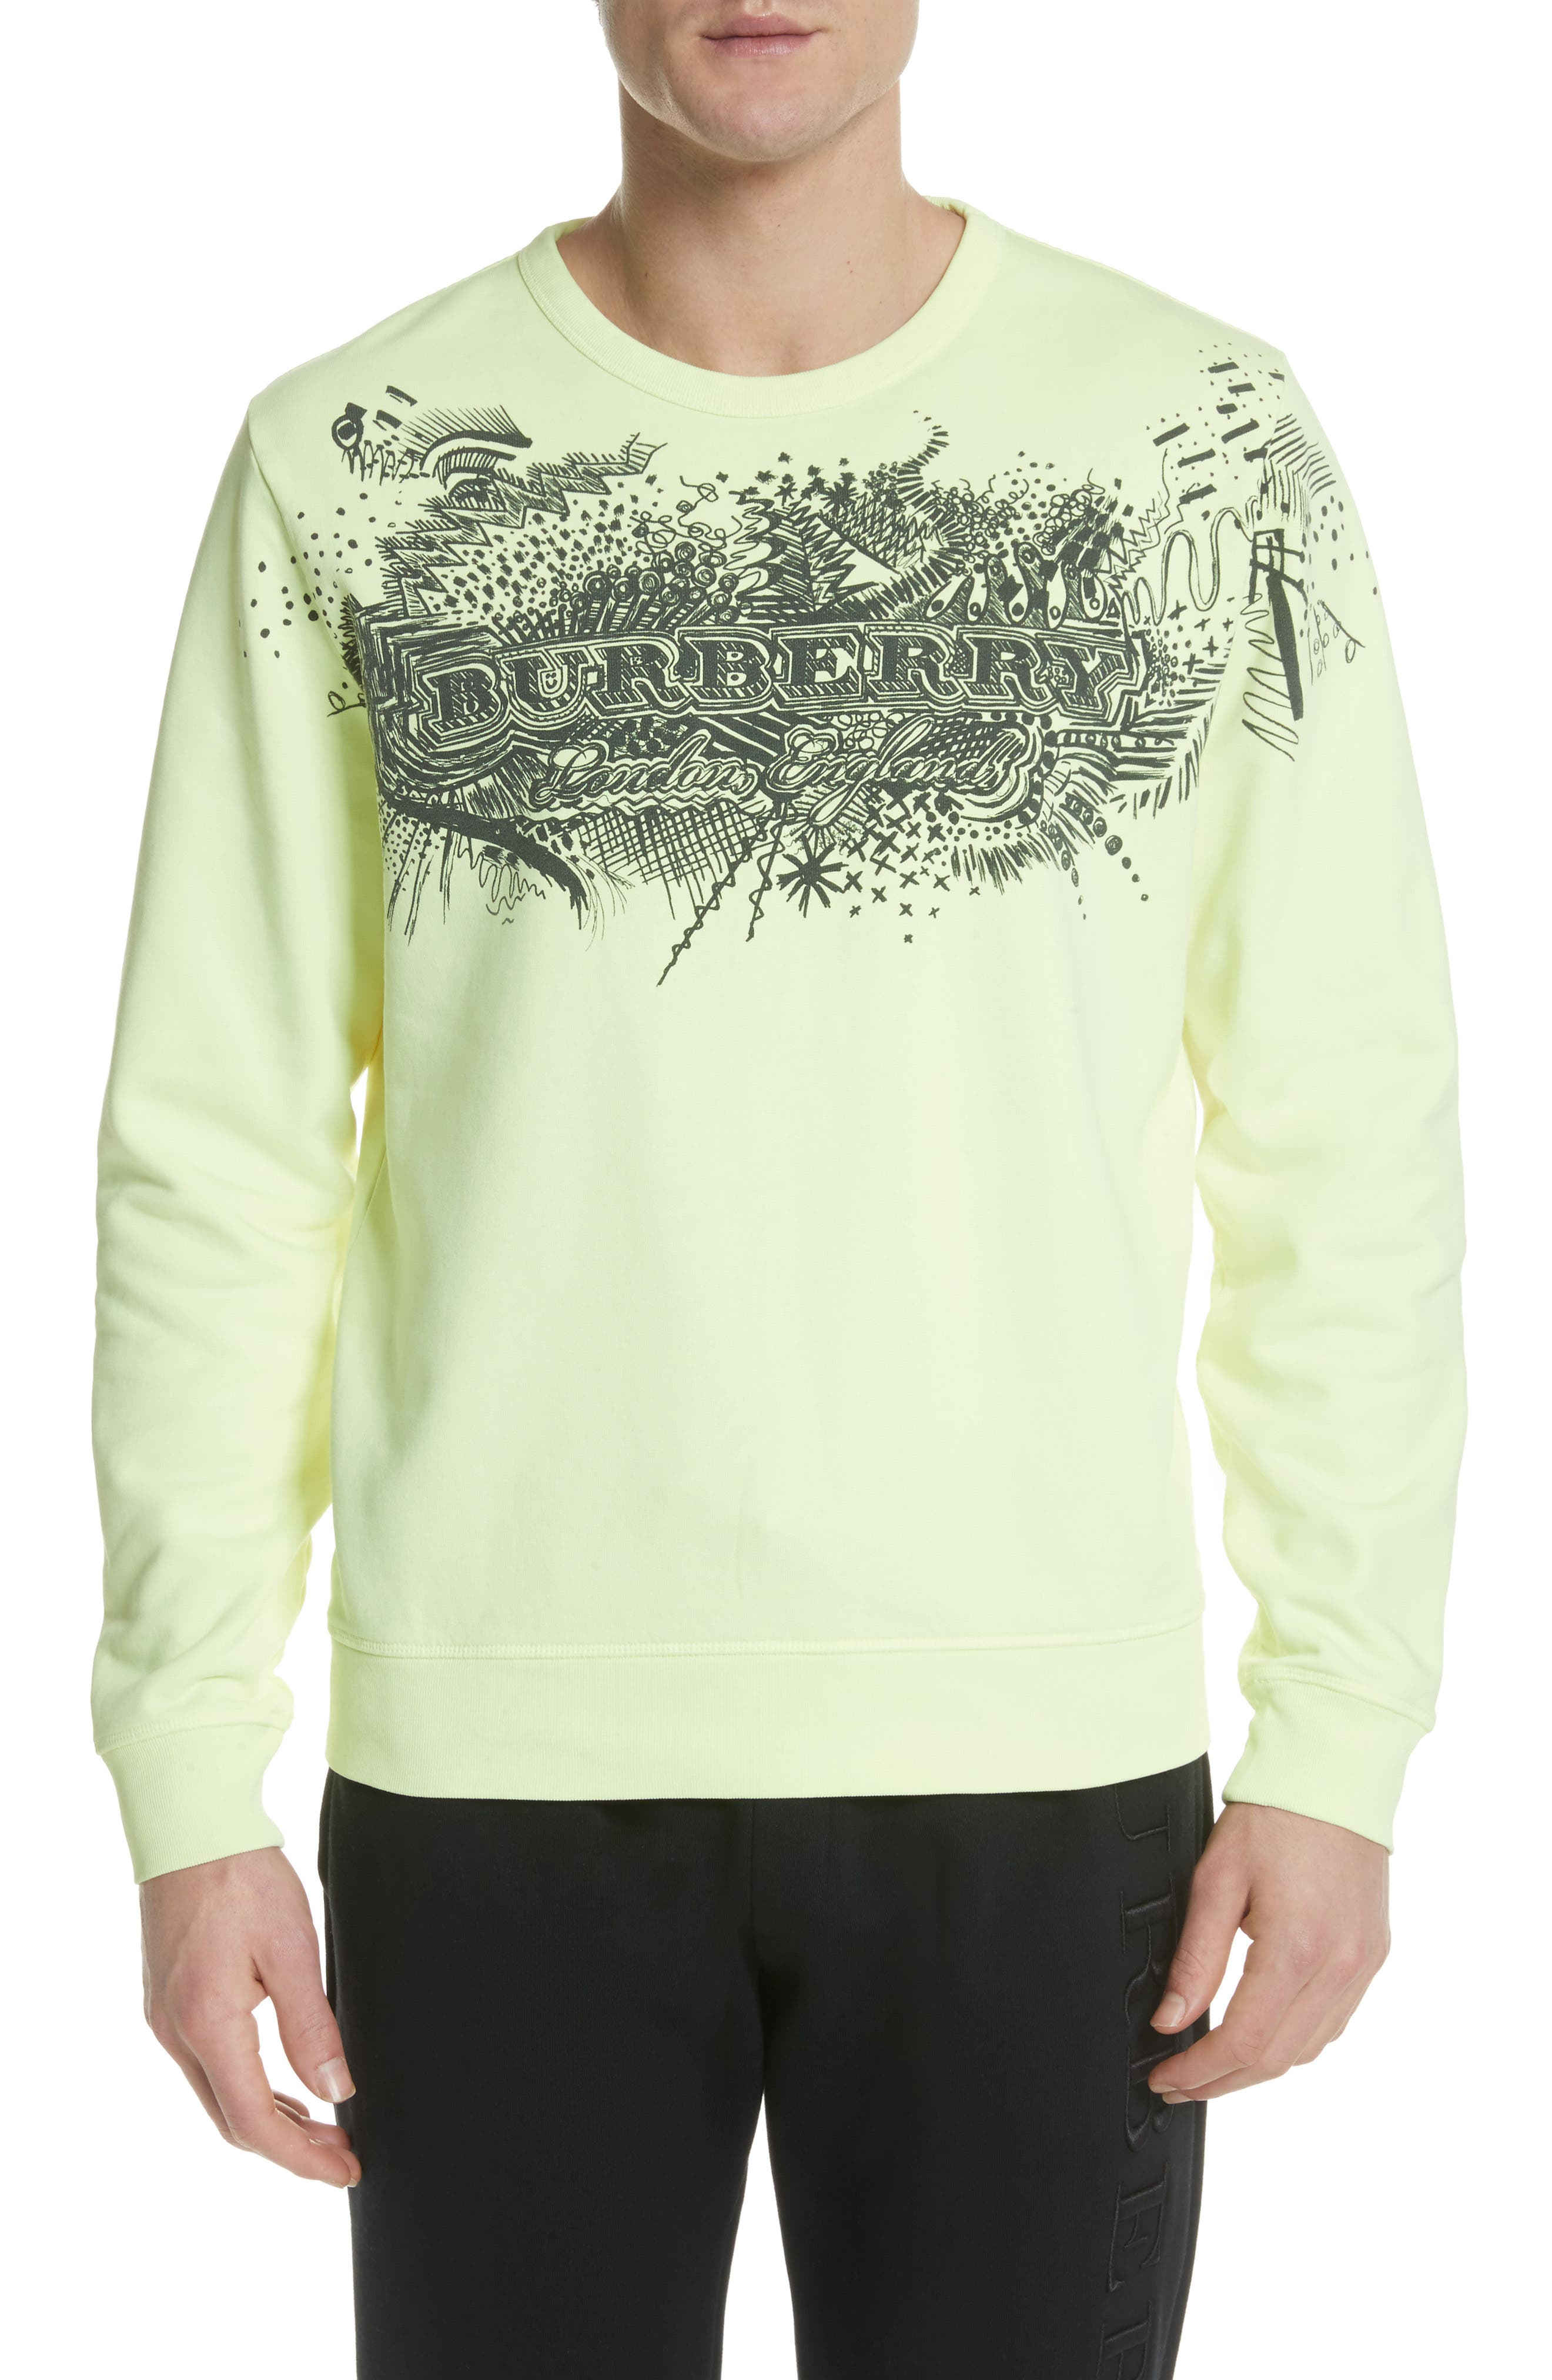 Main Image - Burberry Sauer Graphic Crewneck Sweatshirt